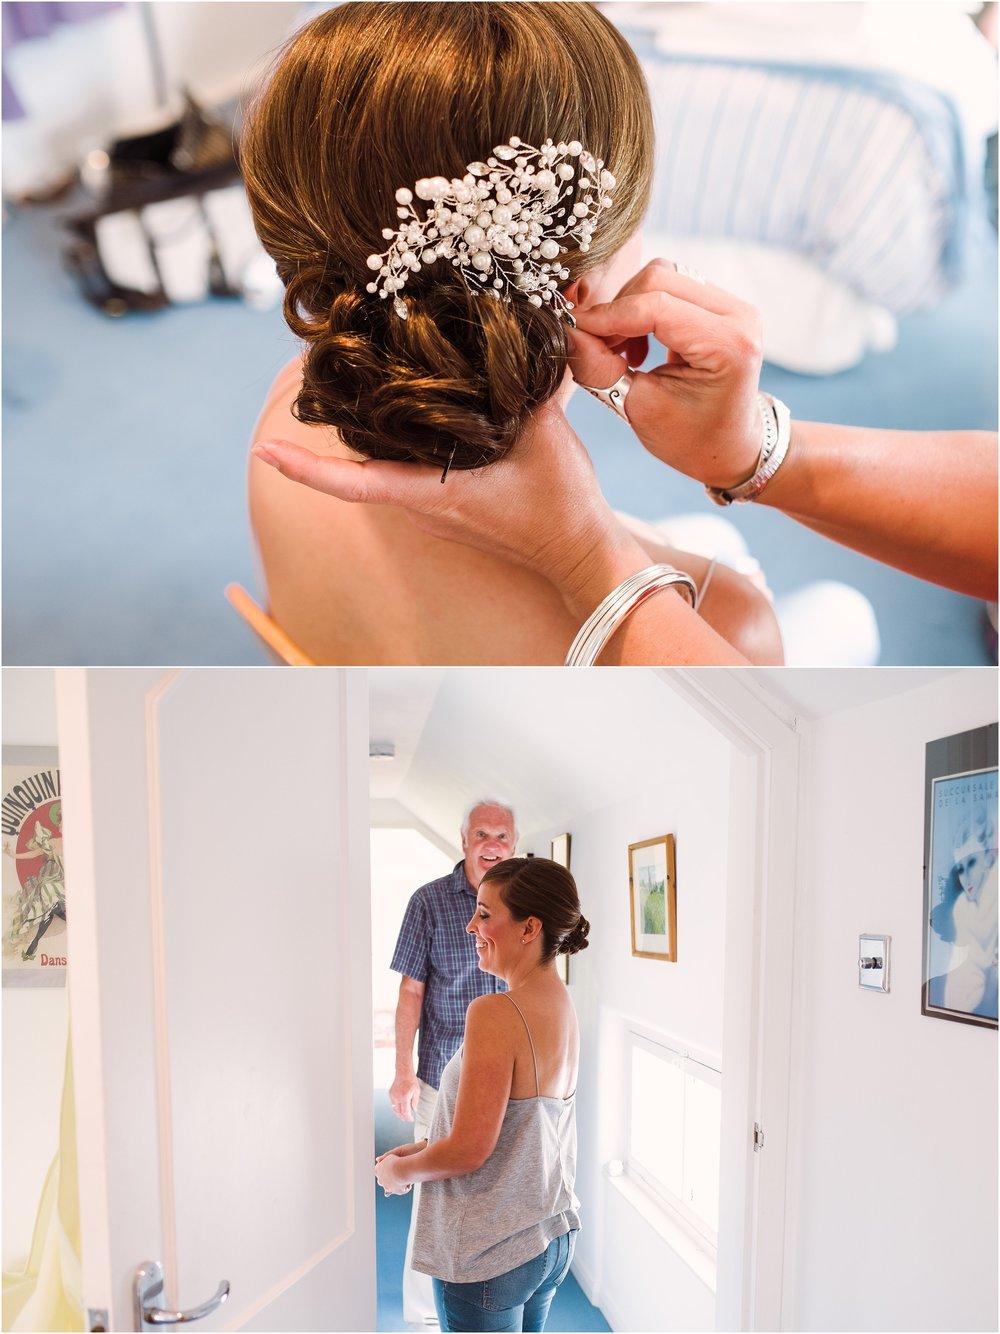 Appuldurcombe wedding_0014.jpg